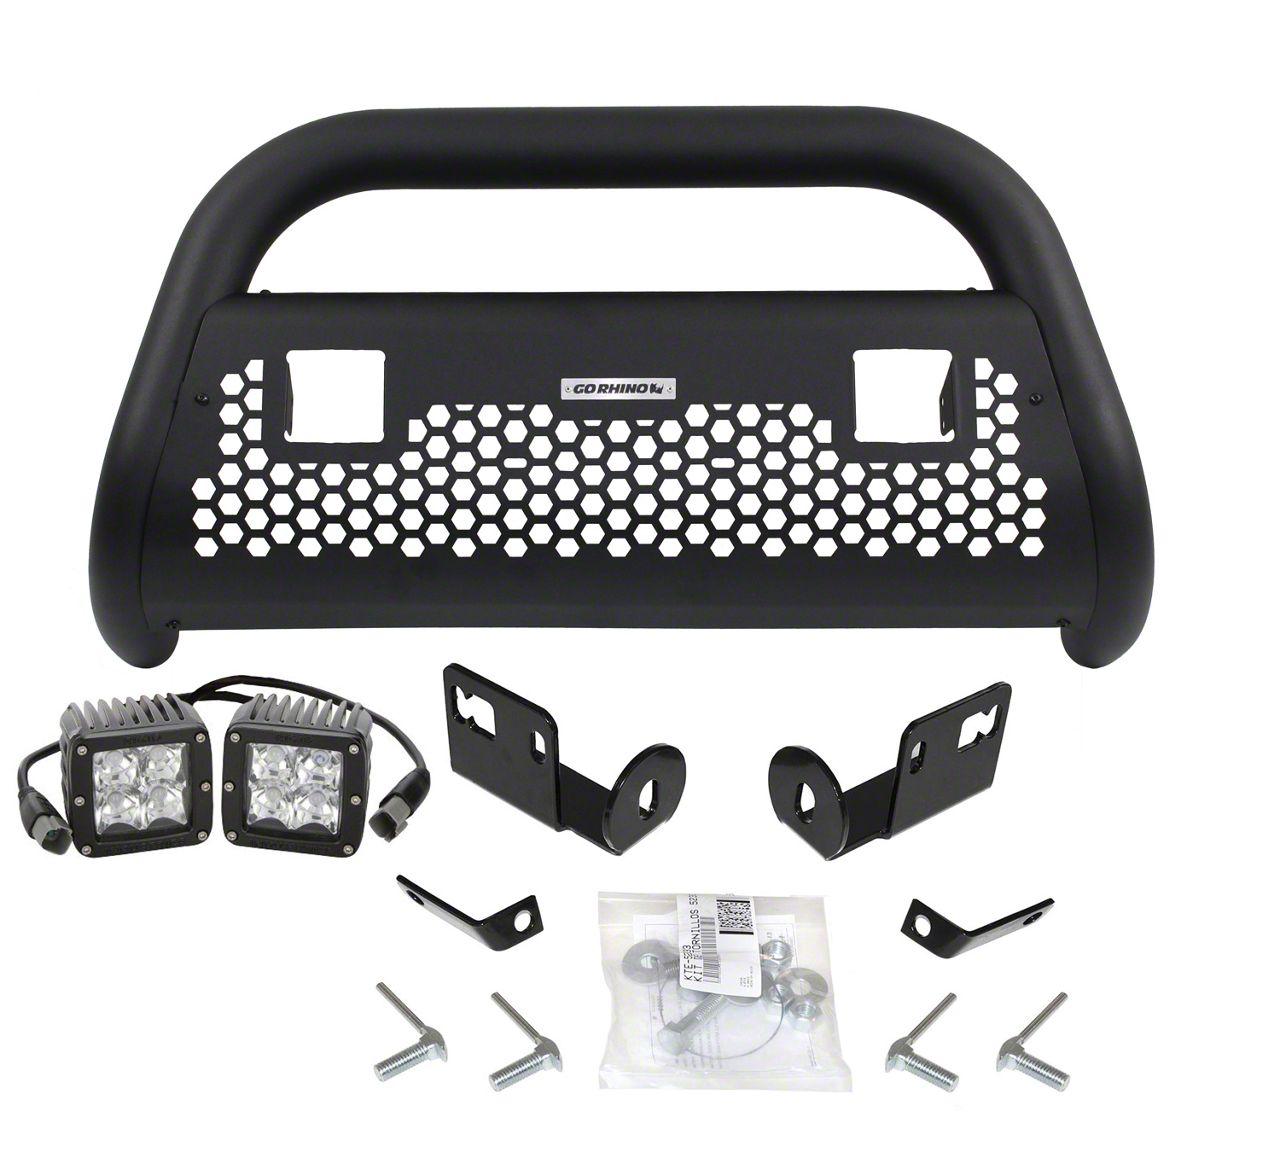 Go Rhino RC2 LR Bull Bar w/ LED Lights - Textured Black (16-19 Tacoma)